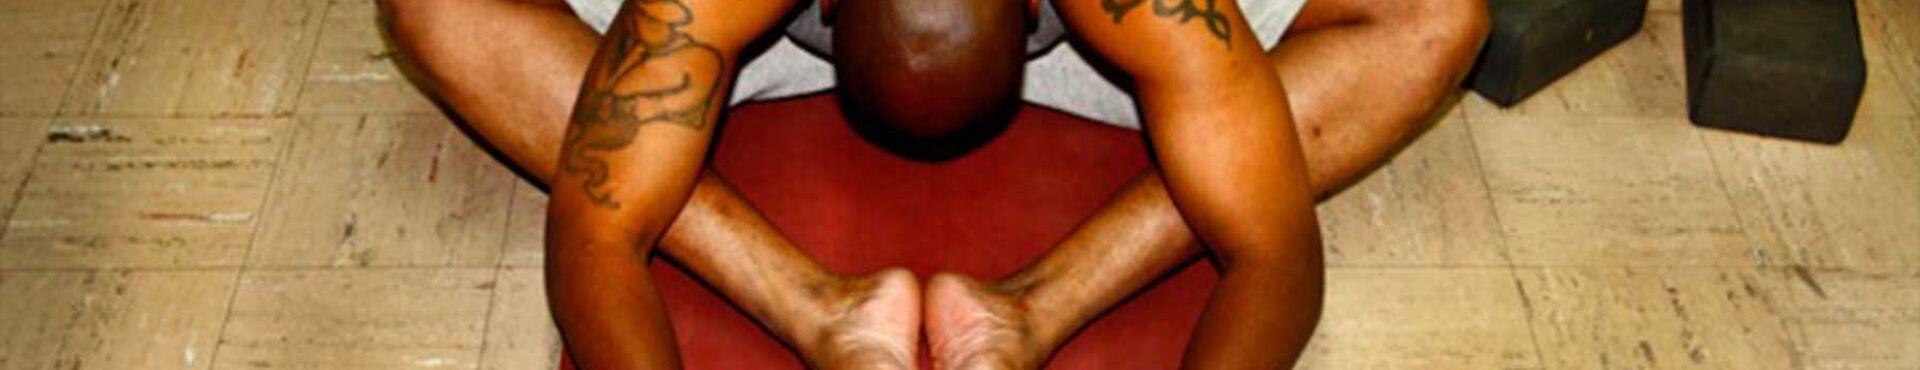 Banner - Prison Yoga Project